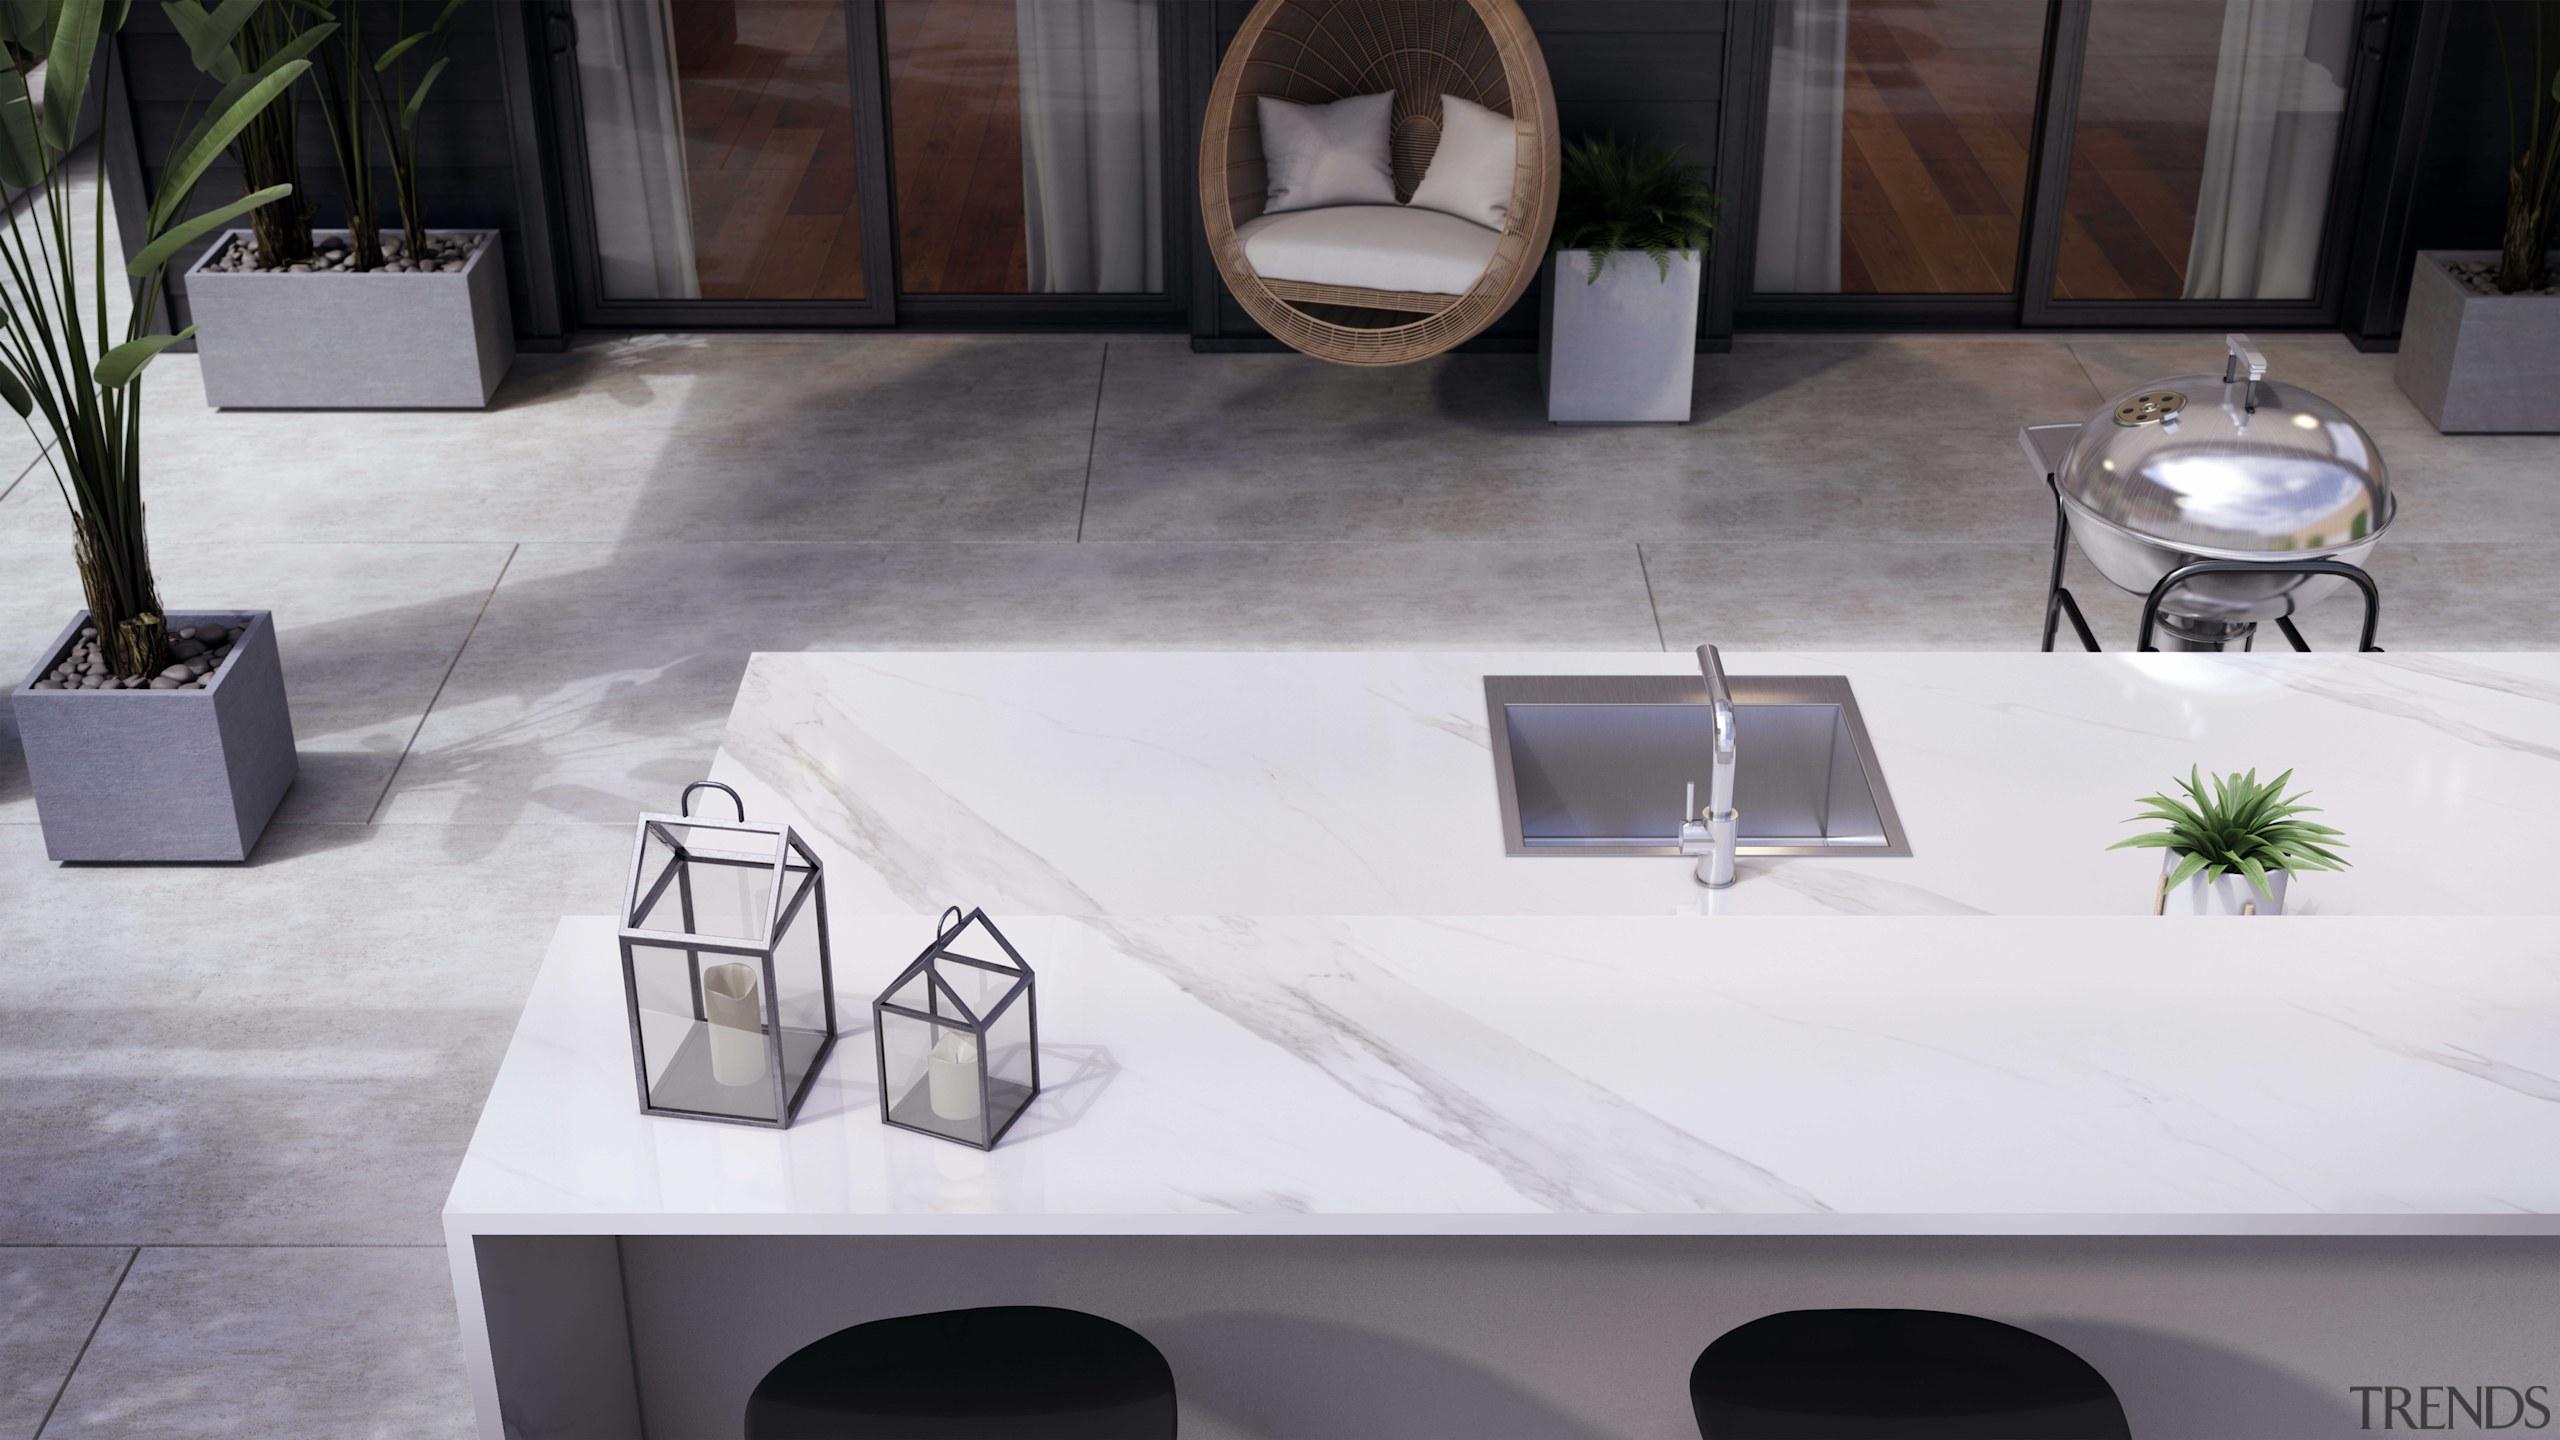 Dekton Outdoor Countertop – Olimpo, Flooring – Keon architecture, coffee table, countertop, design, floor, flooring, furniture, interior design, marble, material property, room, sink, table, tile, white, gray